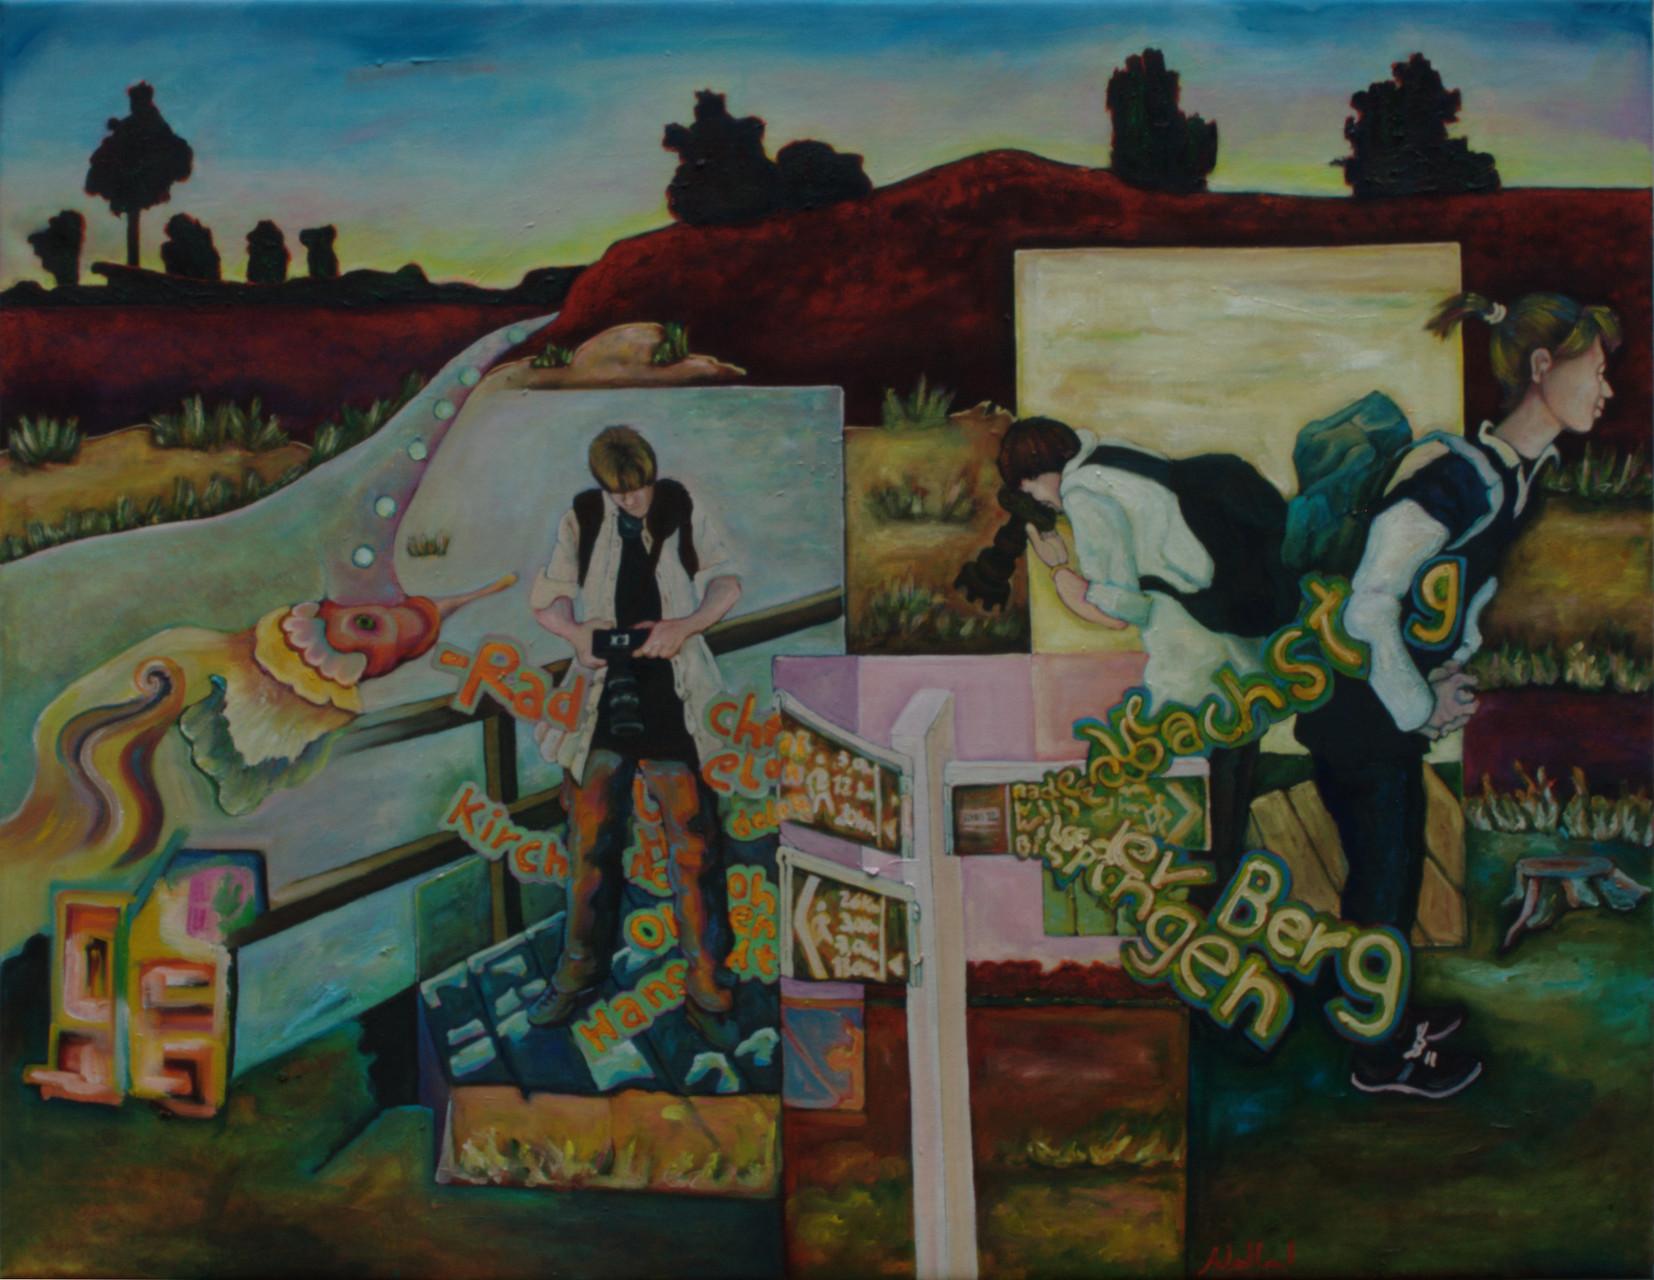 Heidemotive · 2015 · Acryl, Öl auf Leinwand · 97 x 75 cm